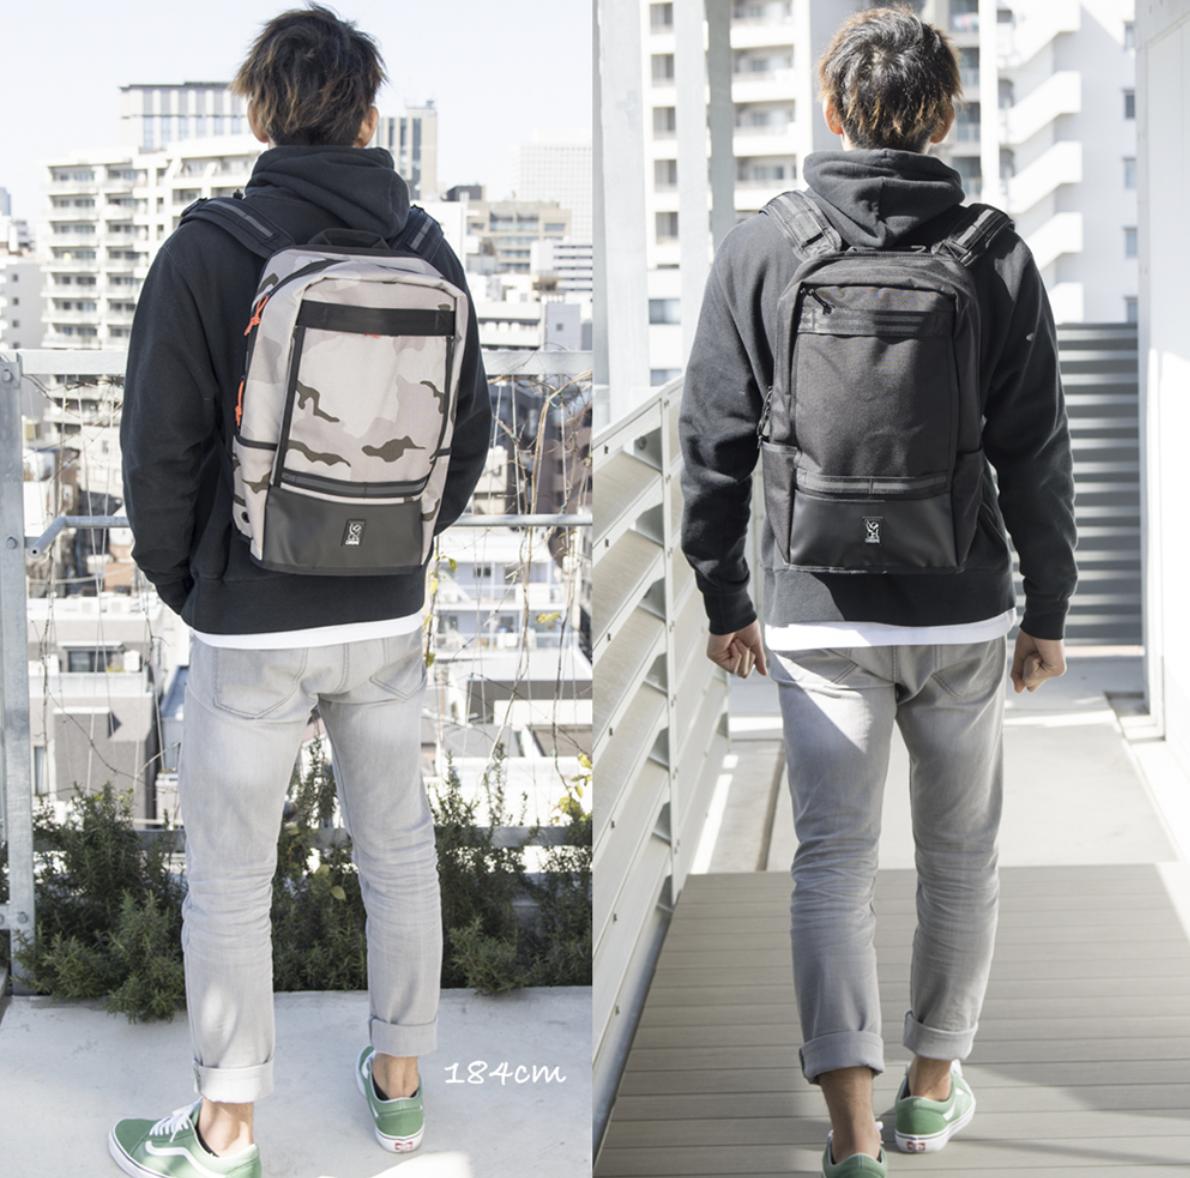 f:id:thebackpack:20190520215007p:plain